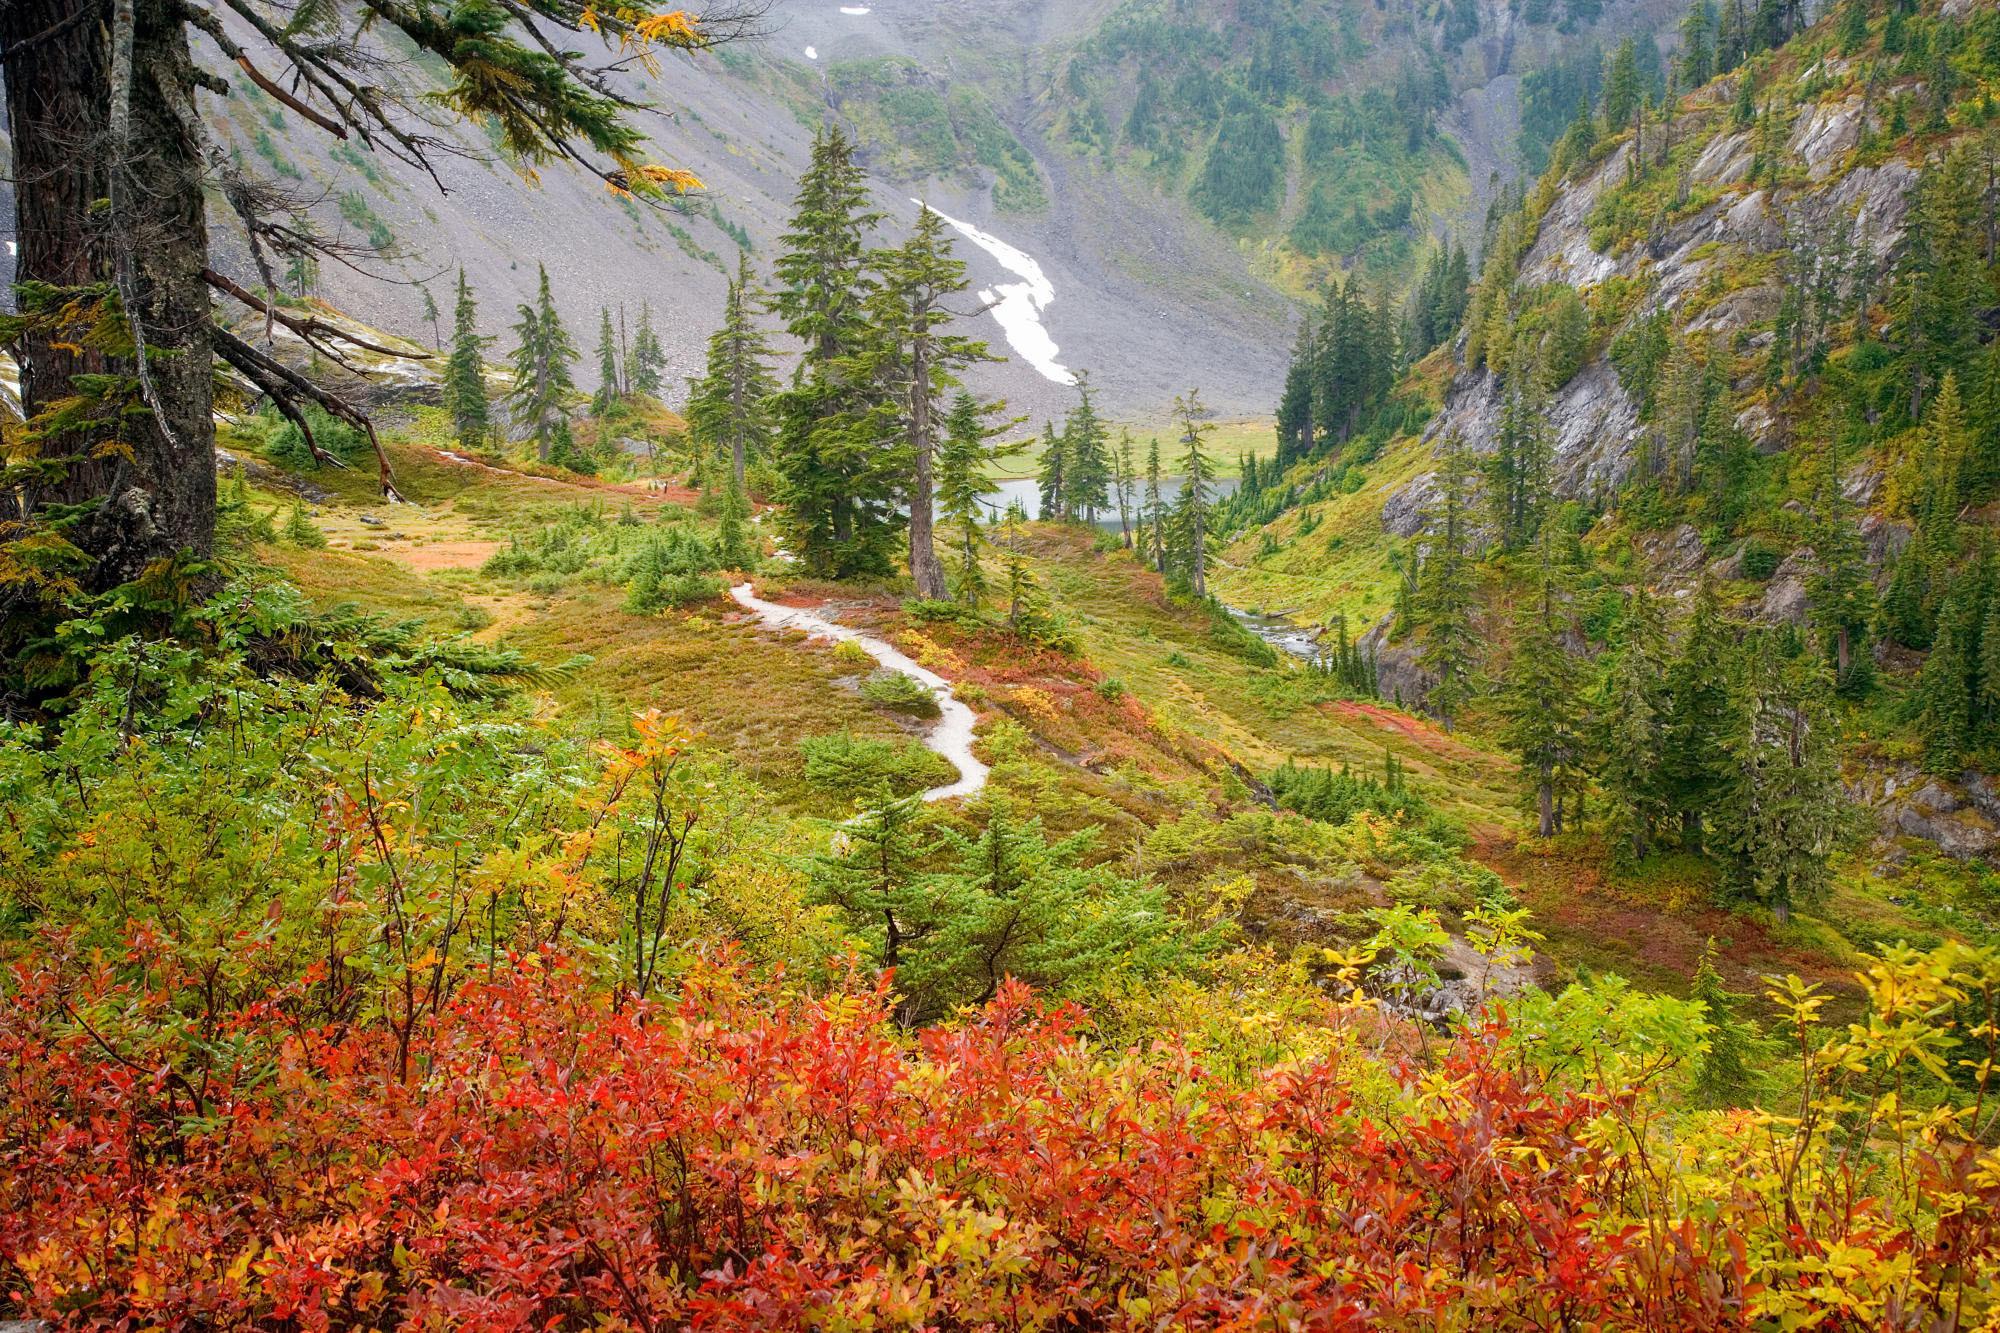 autumn season | Fall Season Desktop